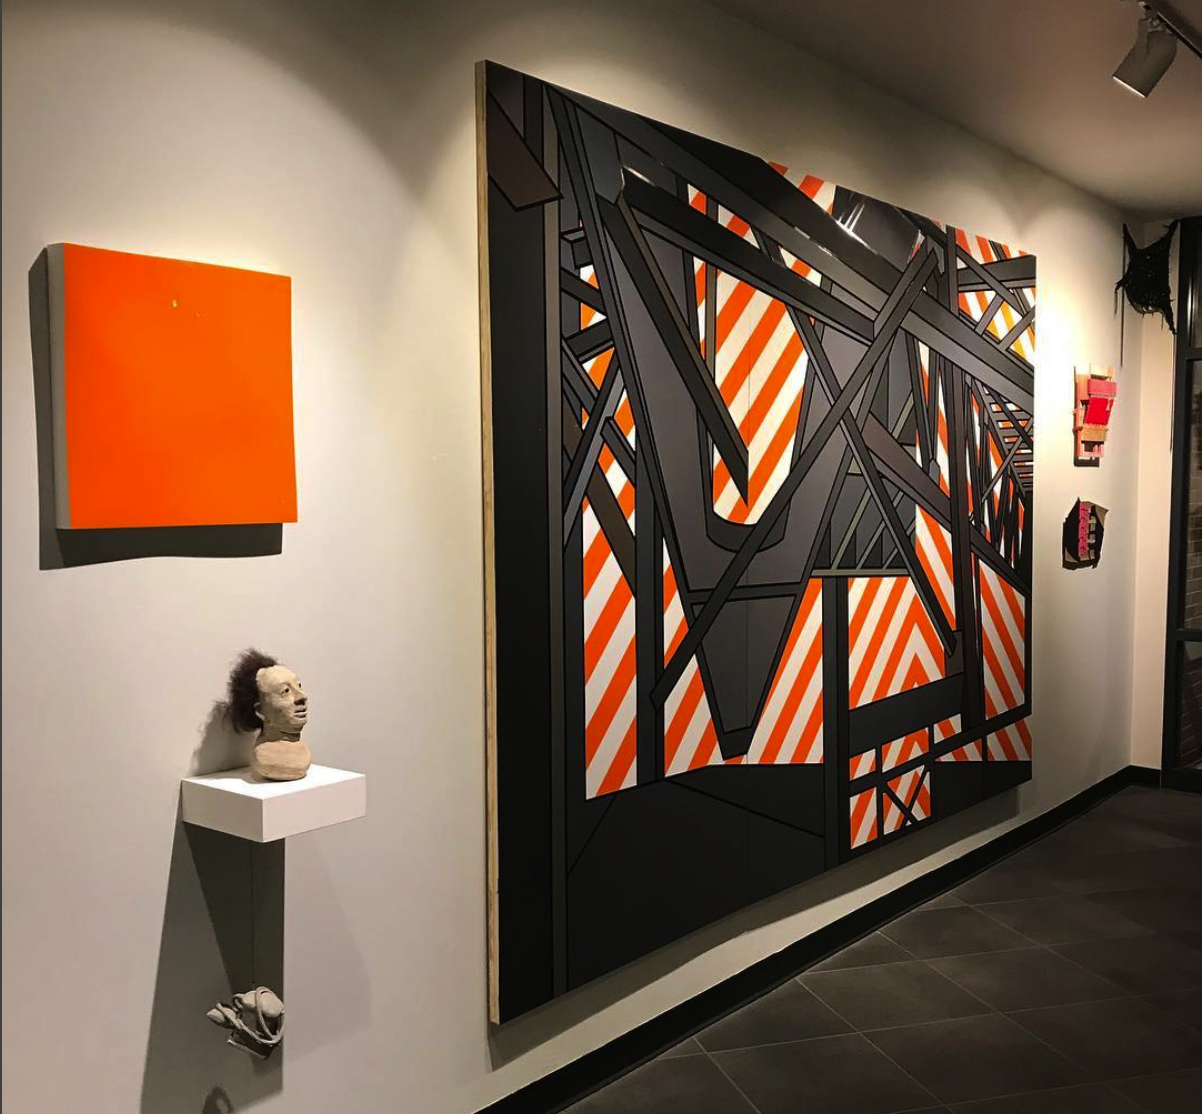 Painting exhibit in gallery